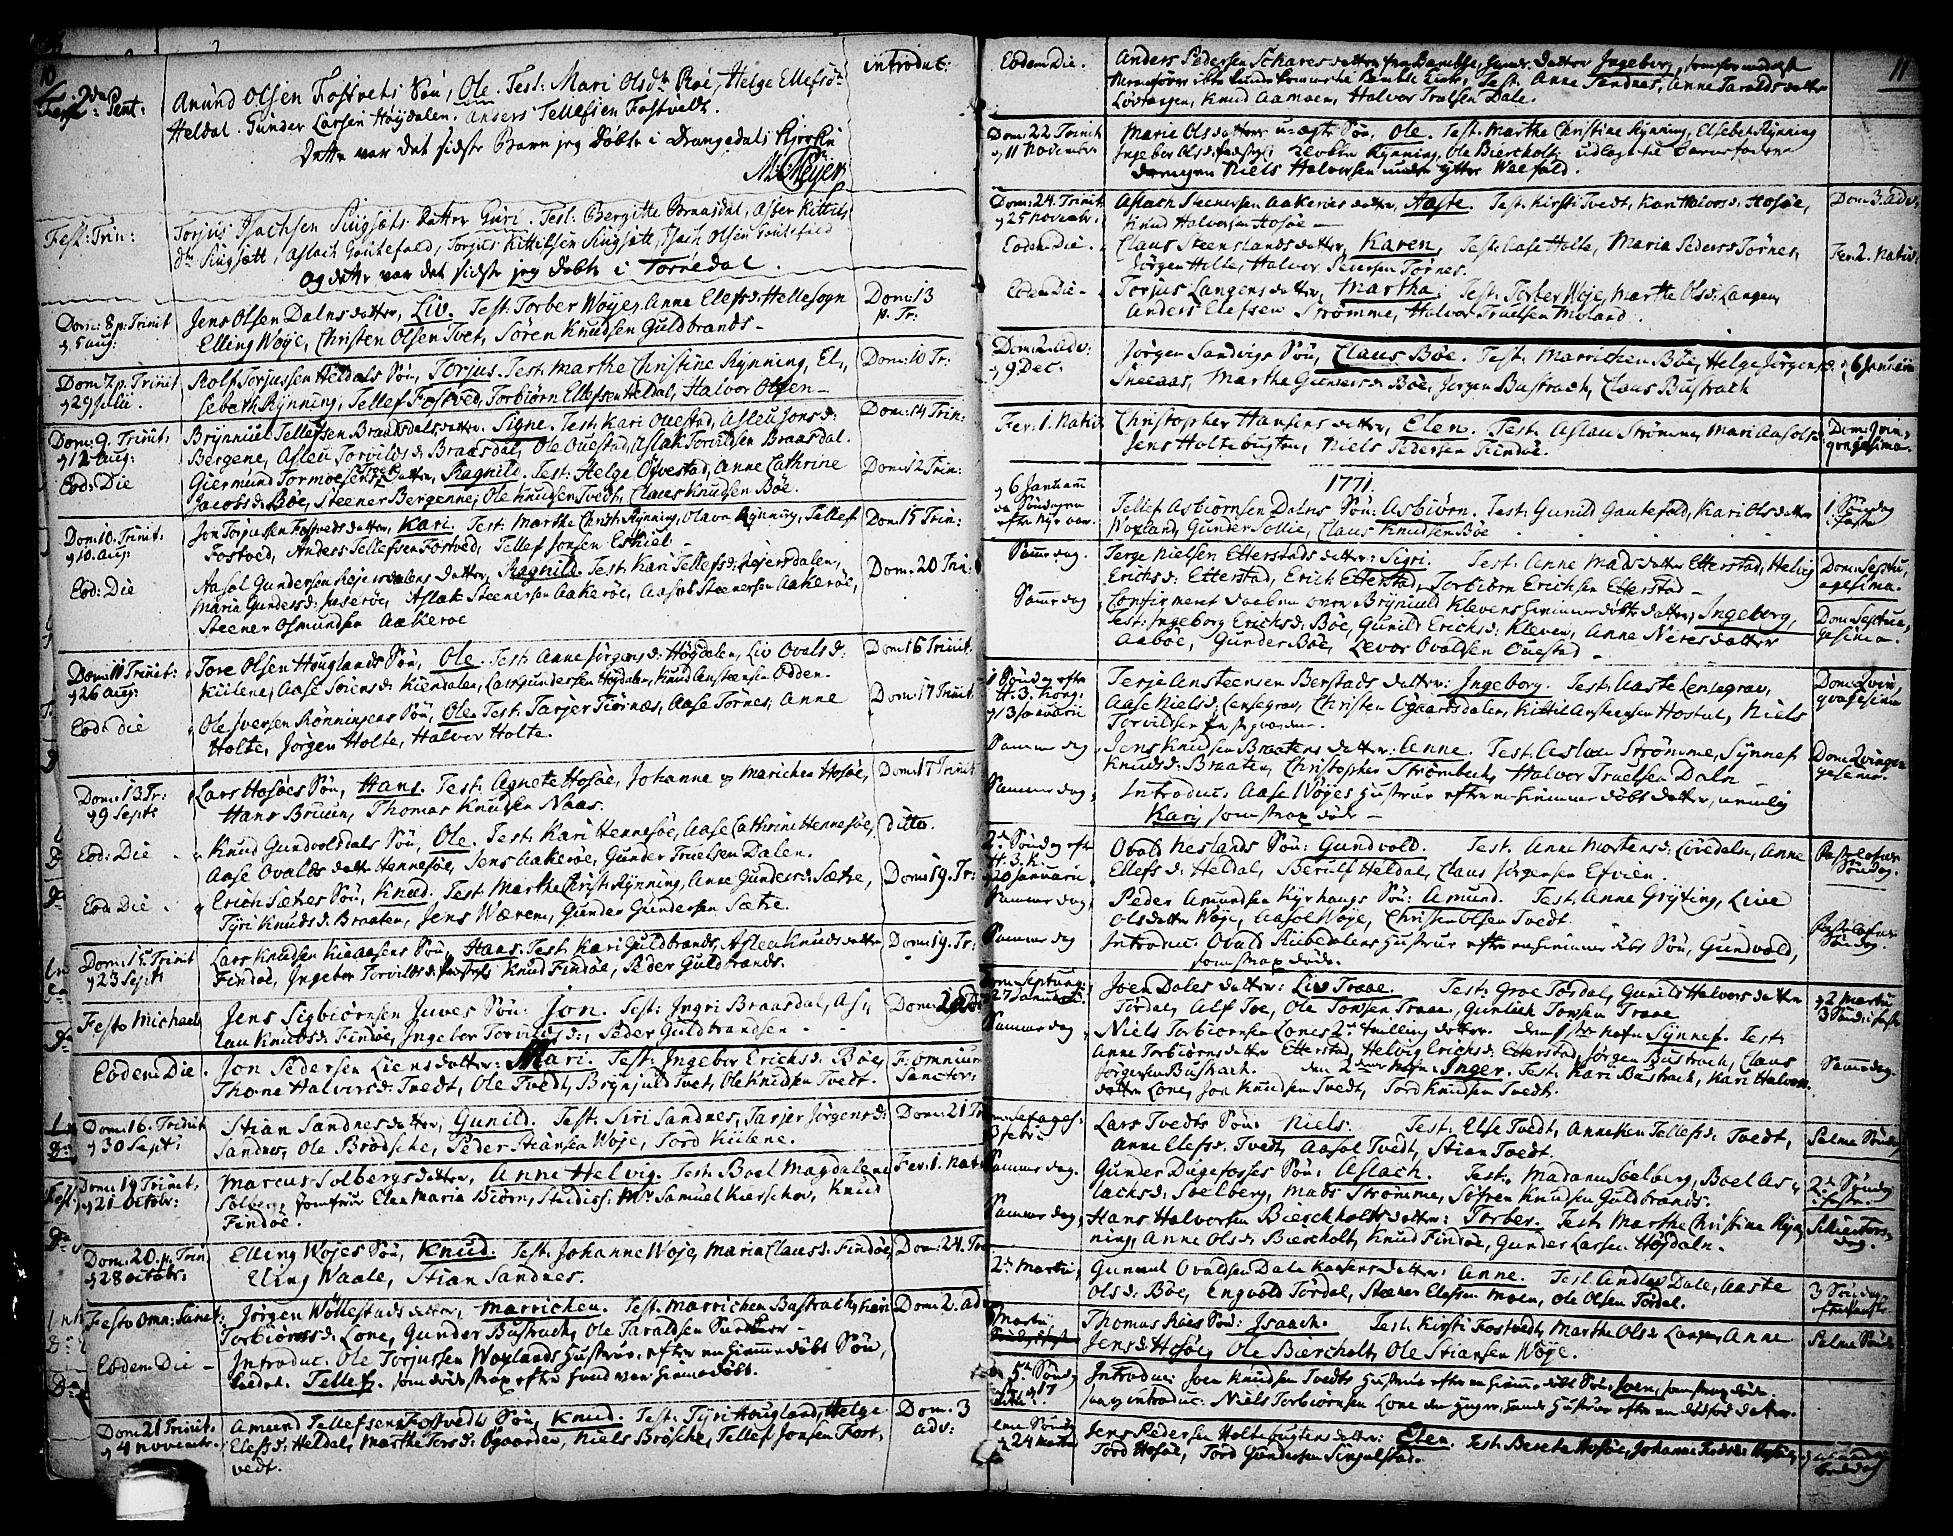 SAKO, Drangedal kirkebøker, F/Fa/L0003: Ministerialbok nr. 3, 1768-1814, s. 10-11